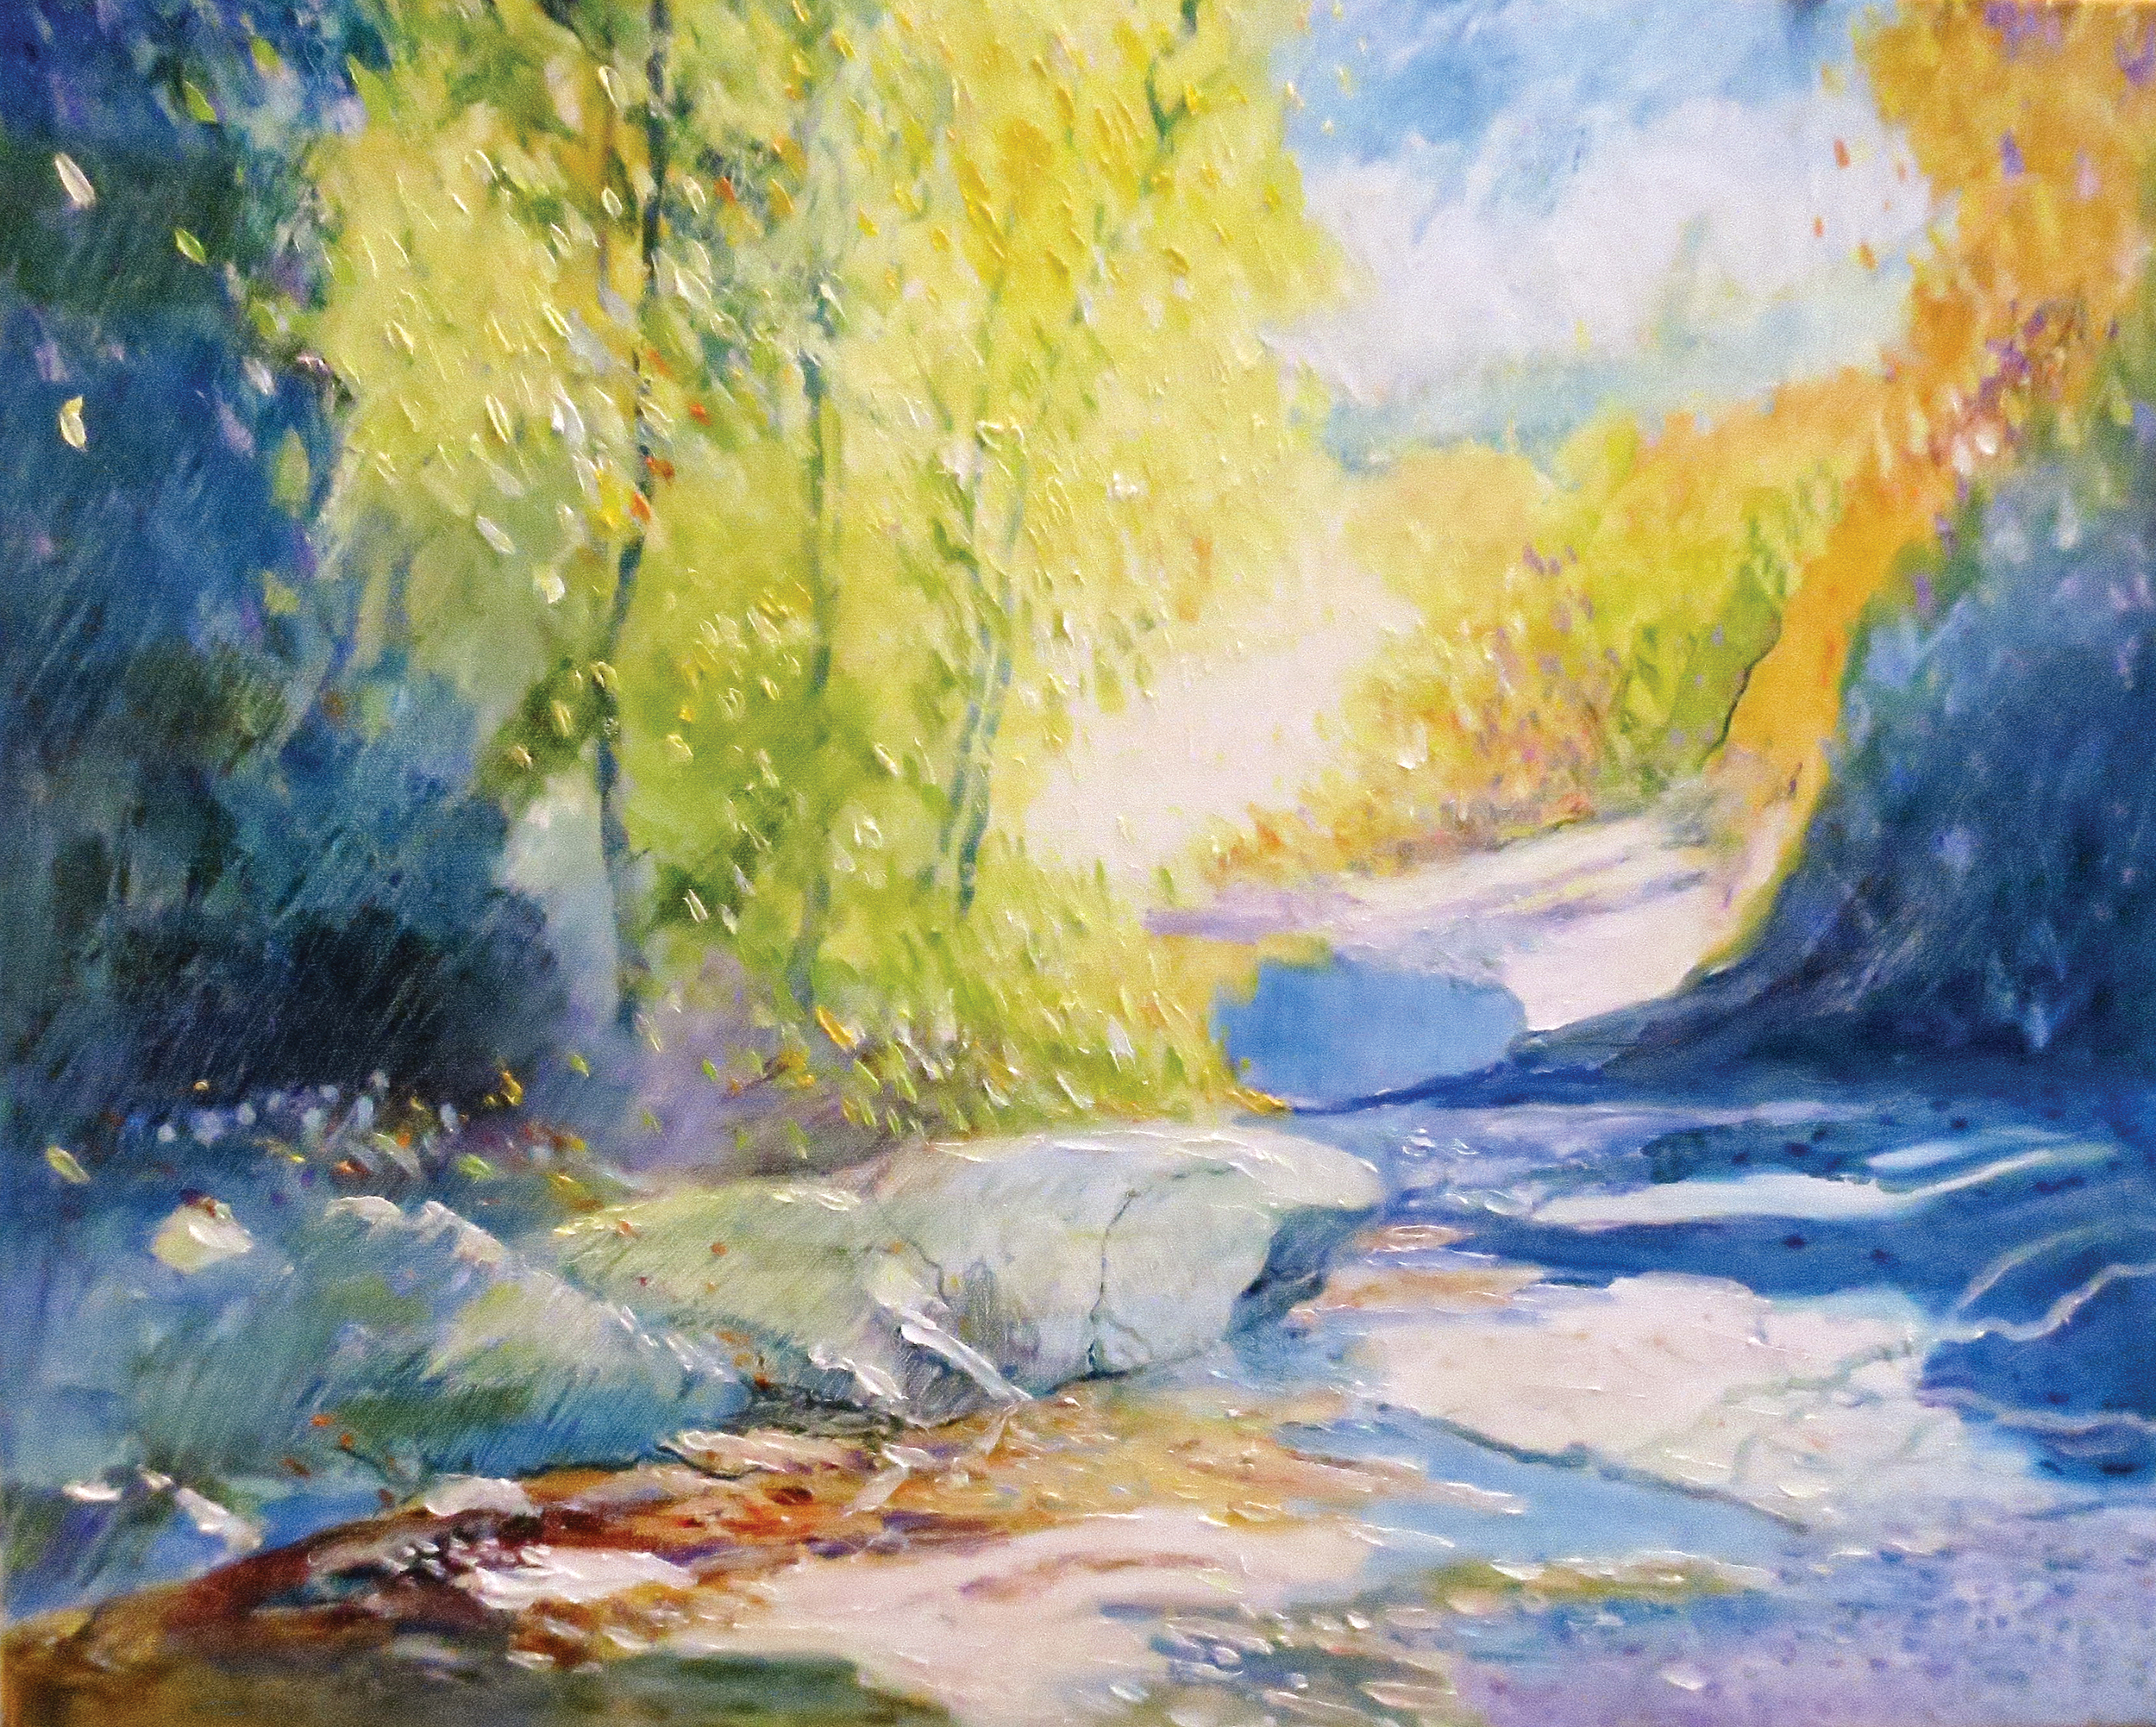 Wilson Creek, Grayson Highlands, VA (sold)